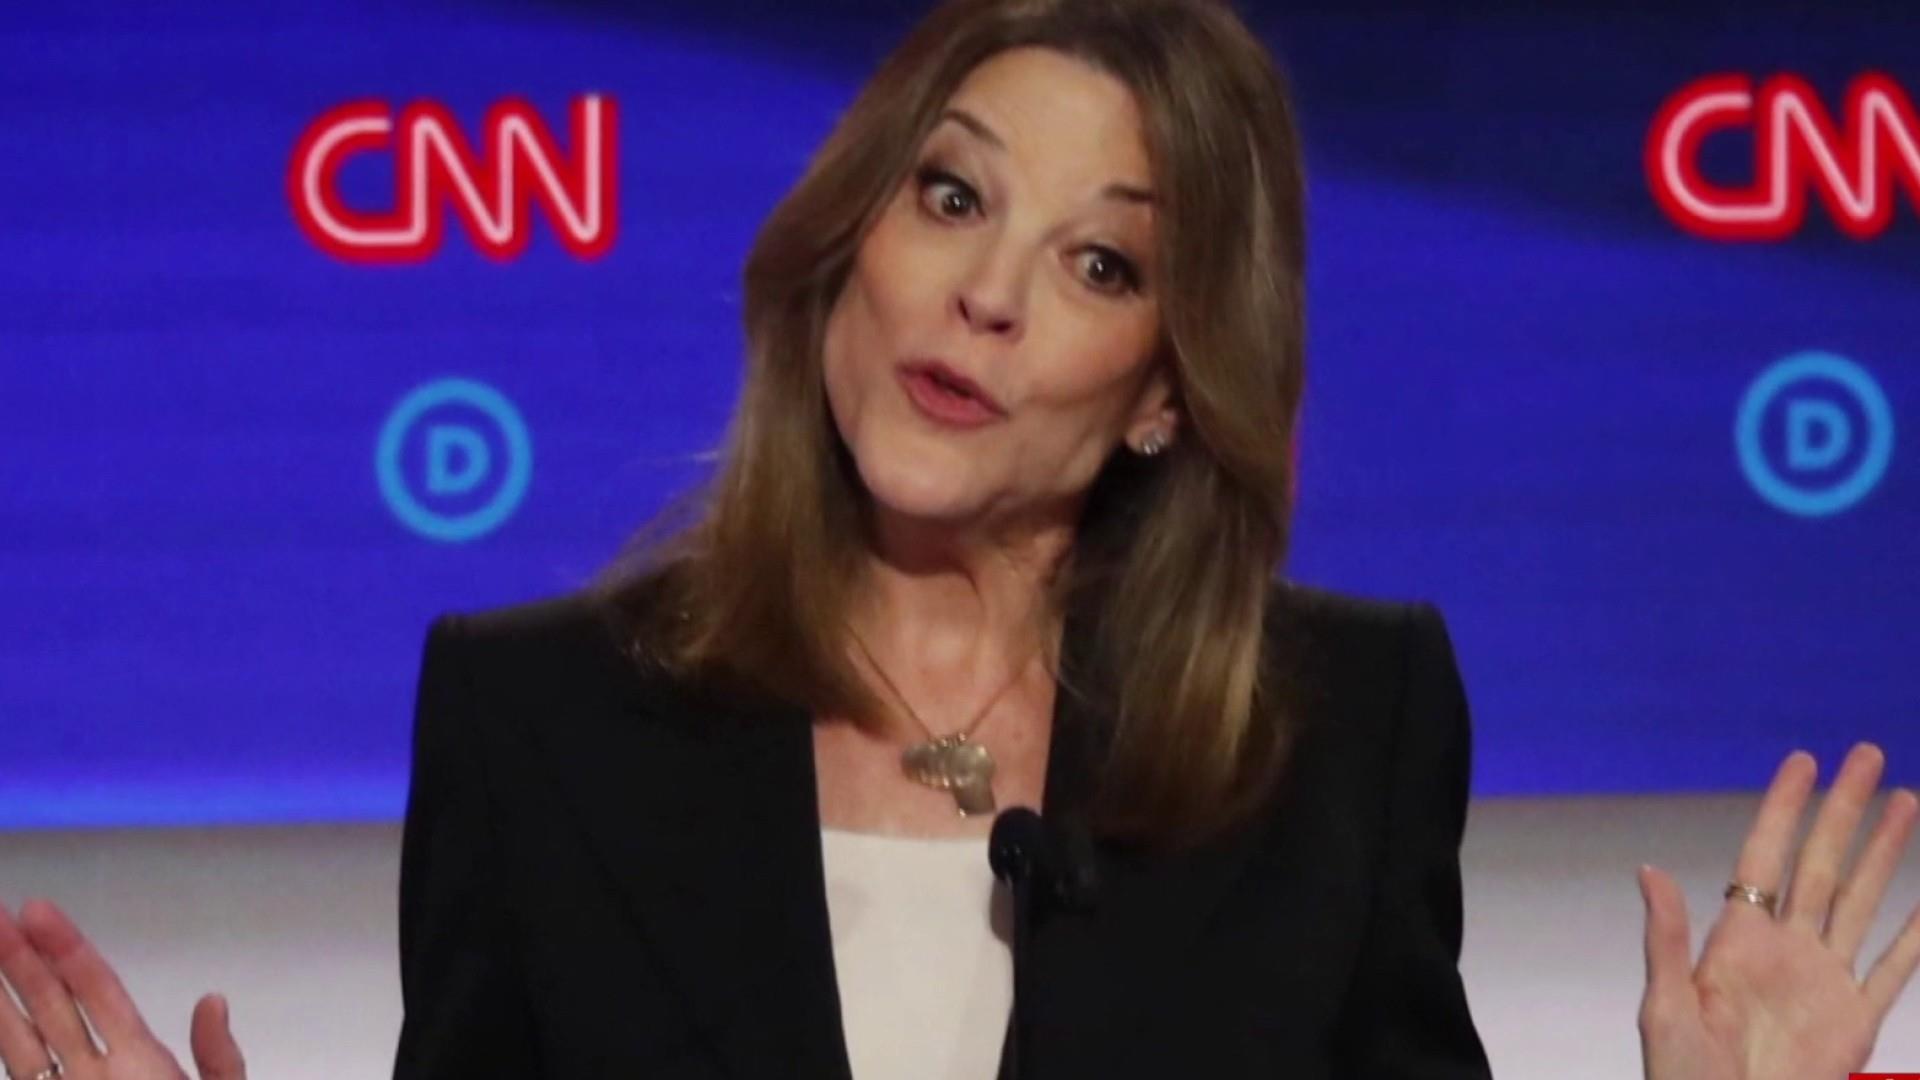 Marianne Williamson makes an impression at debate